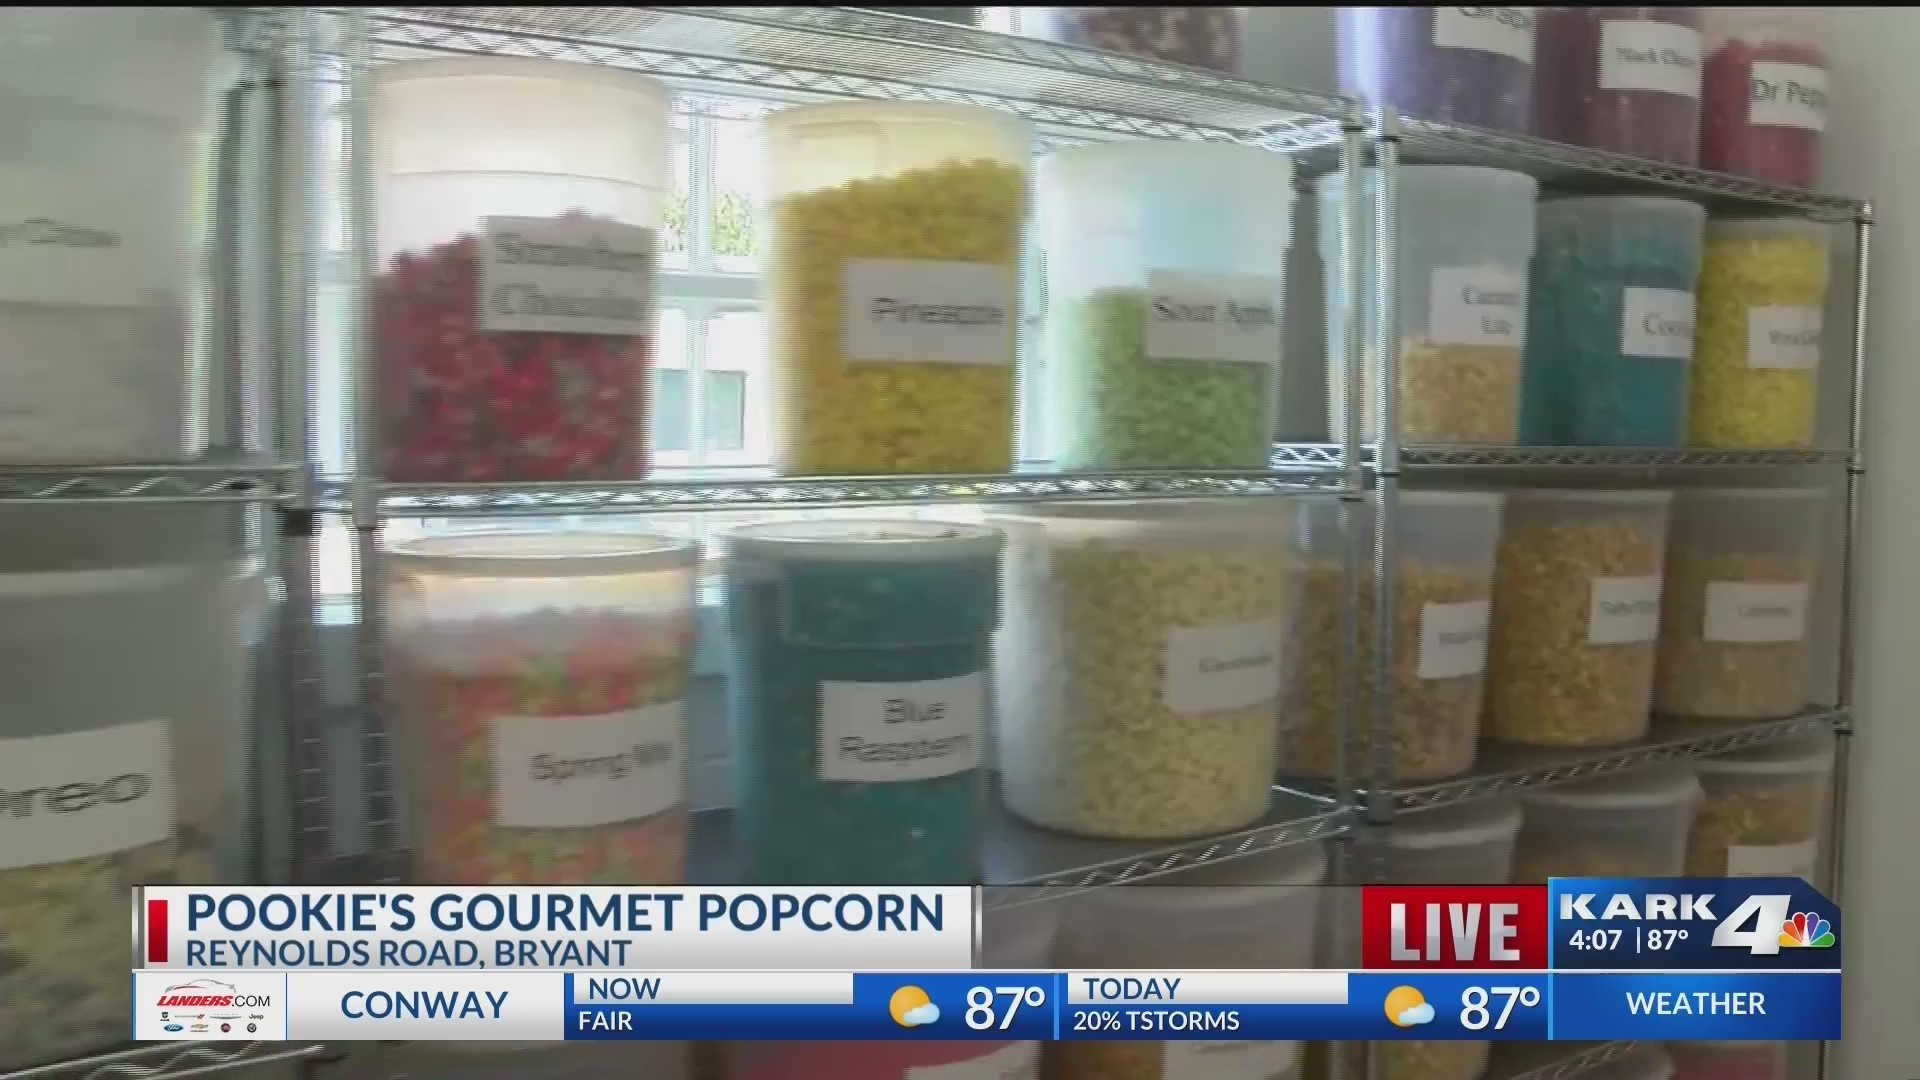 Pookie_s_Popcorn_in_Bryant__85_flavors___0_20190522214517